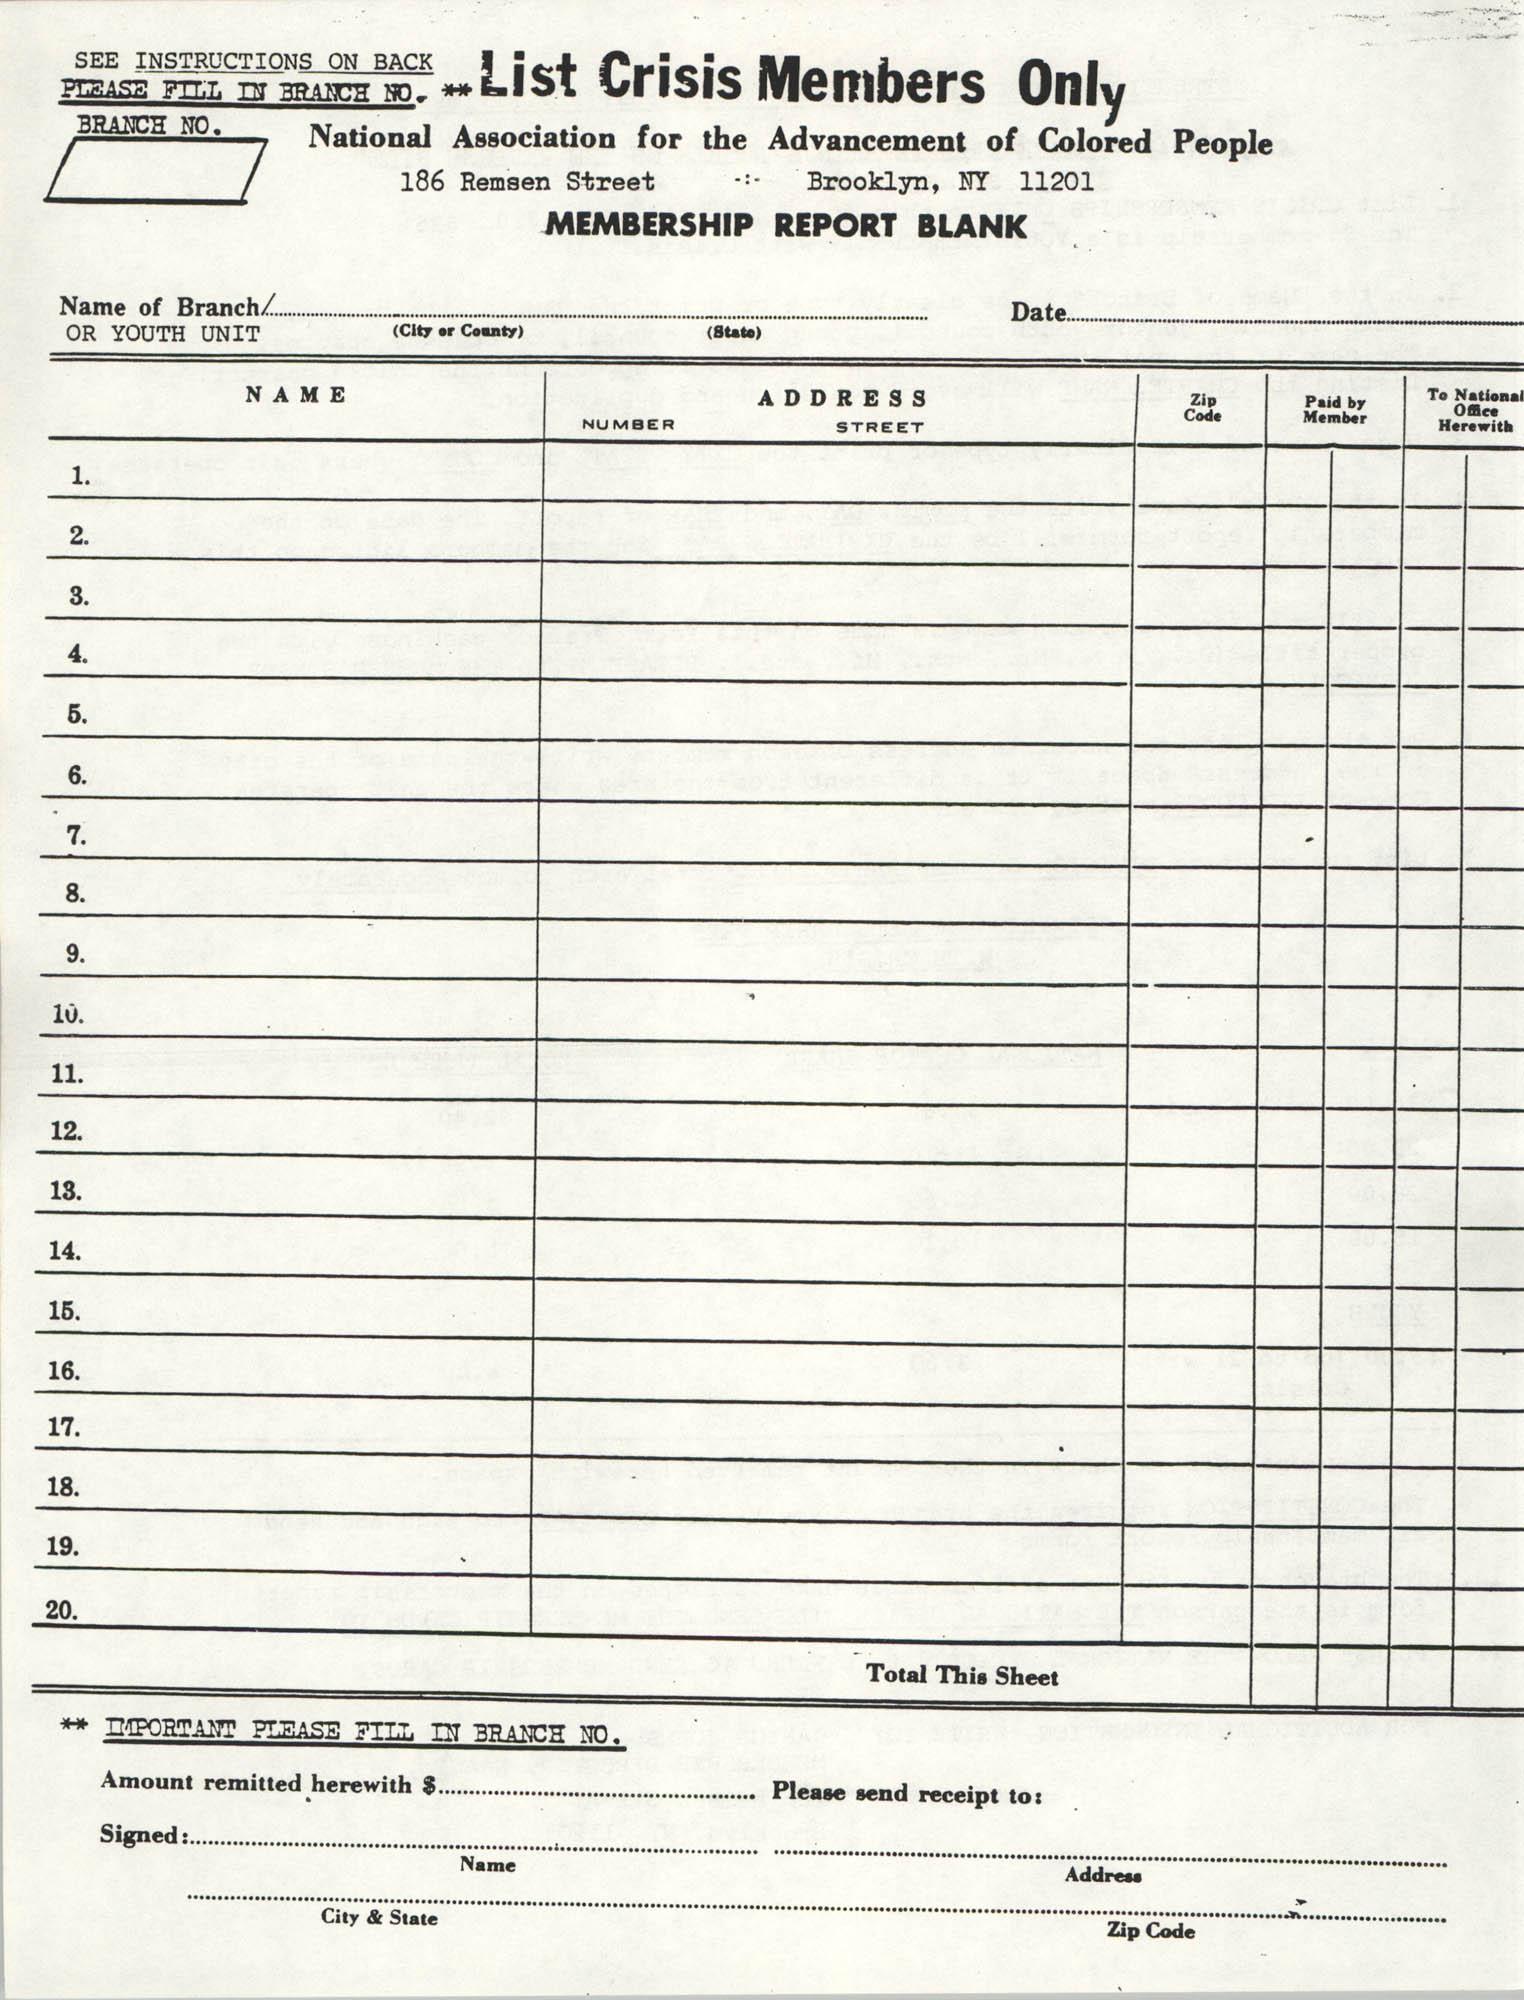 Membership Report Form, List Crisis Members, NAACP